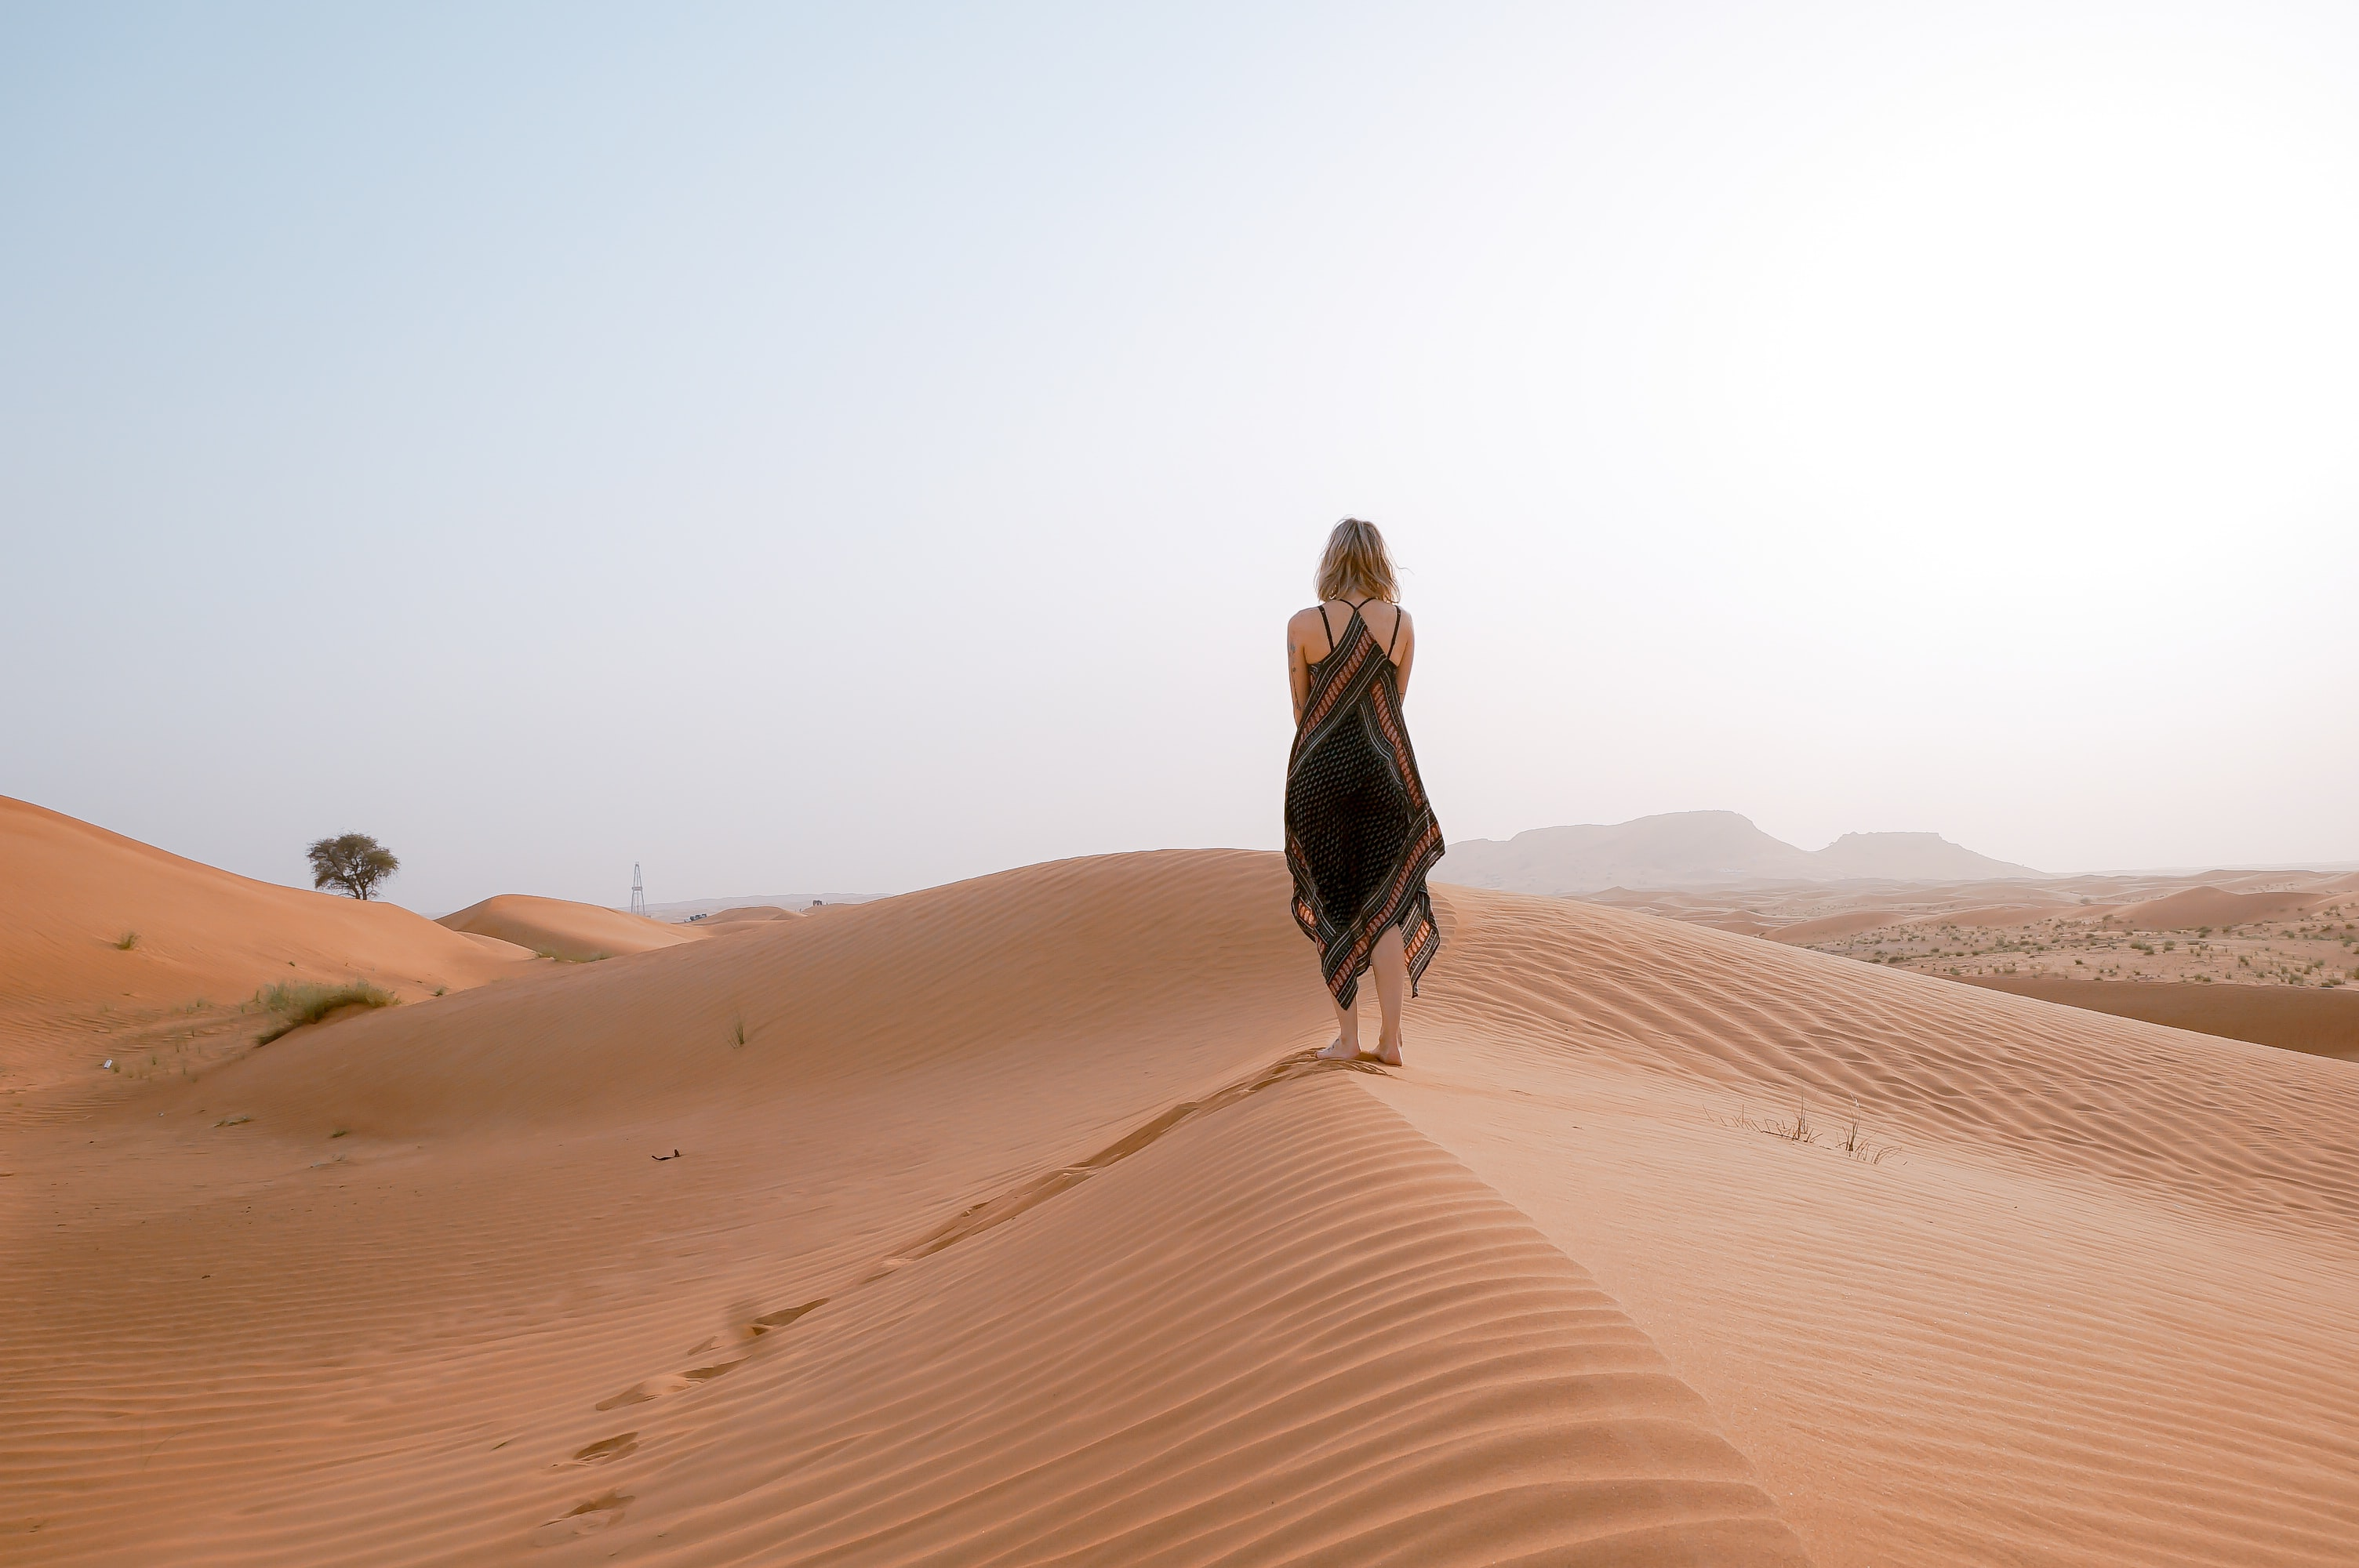 Fashionable woman walks through the dry sandy deserts of Safari Dubai